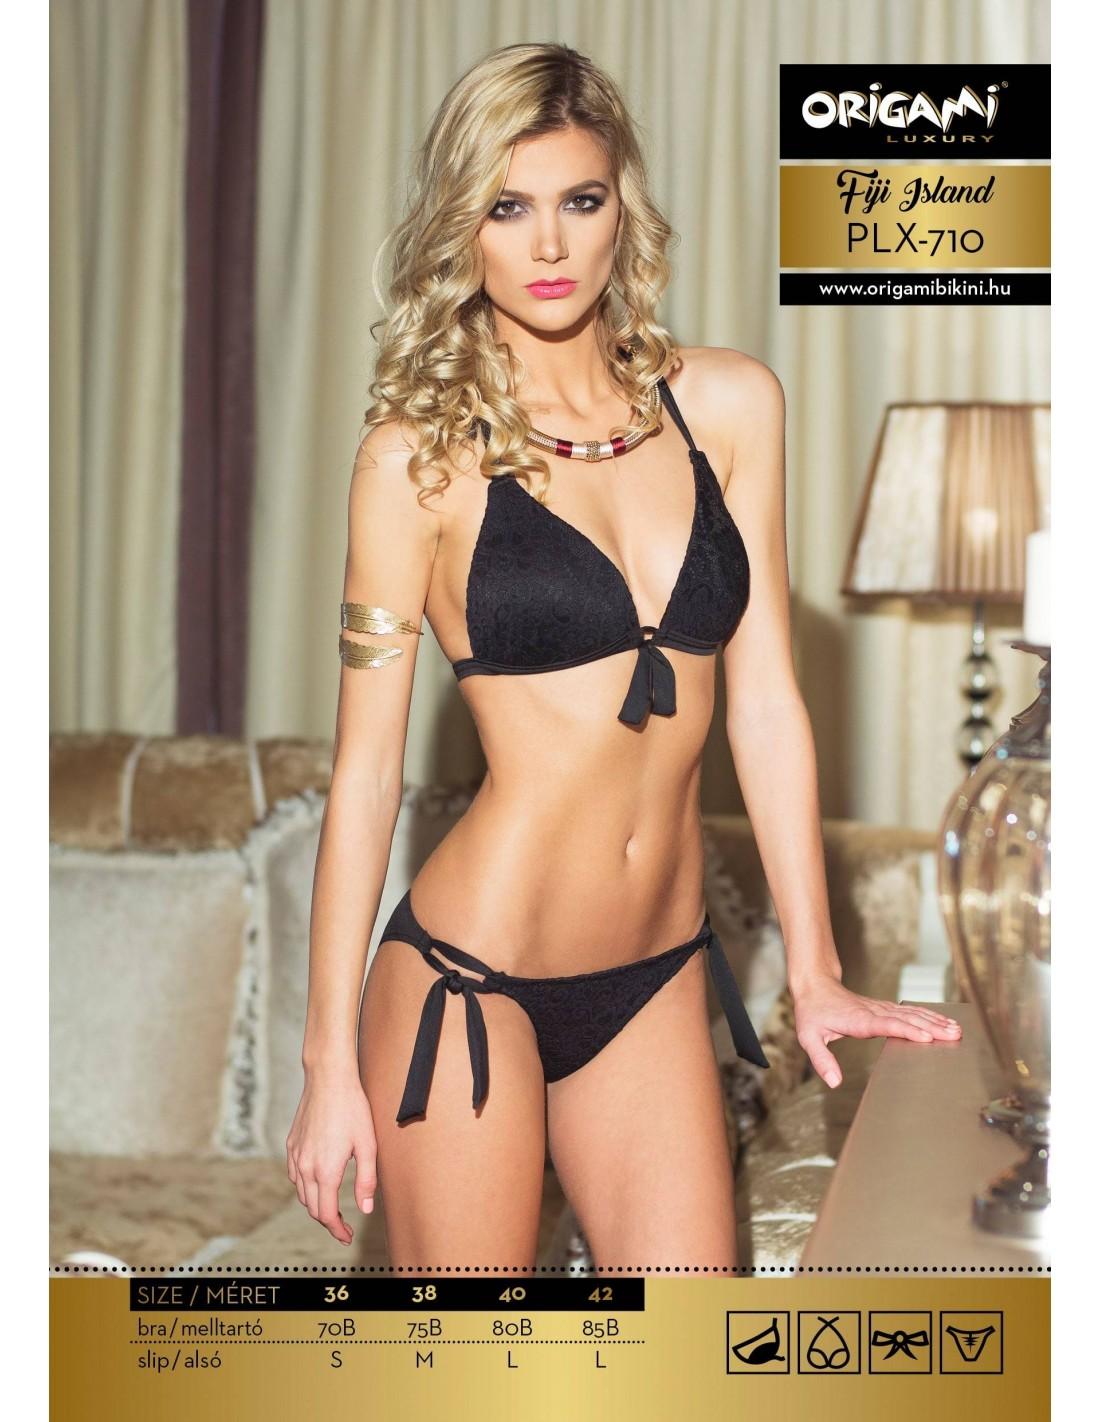 Origami Bikini Fiji Island Luxury PLX-710 6d9ebf3e7c